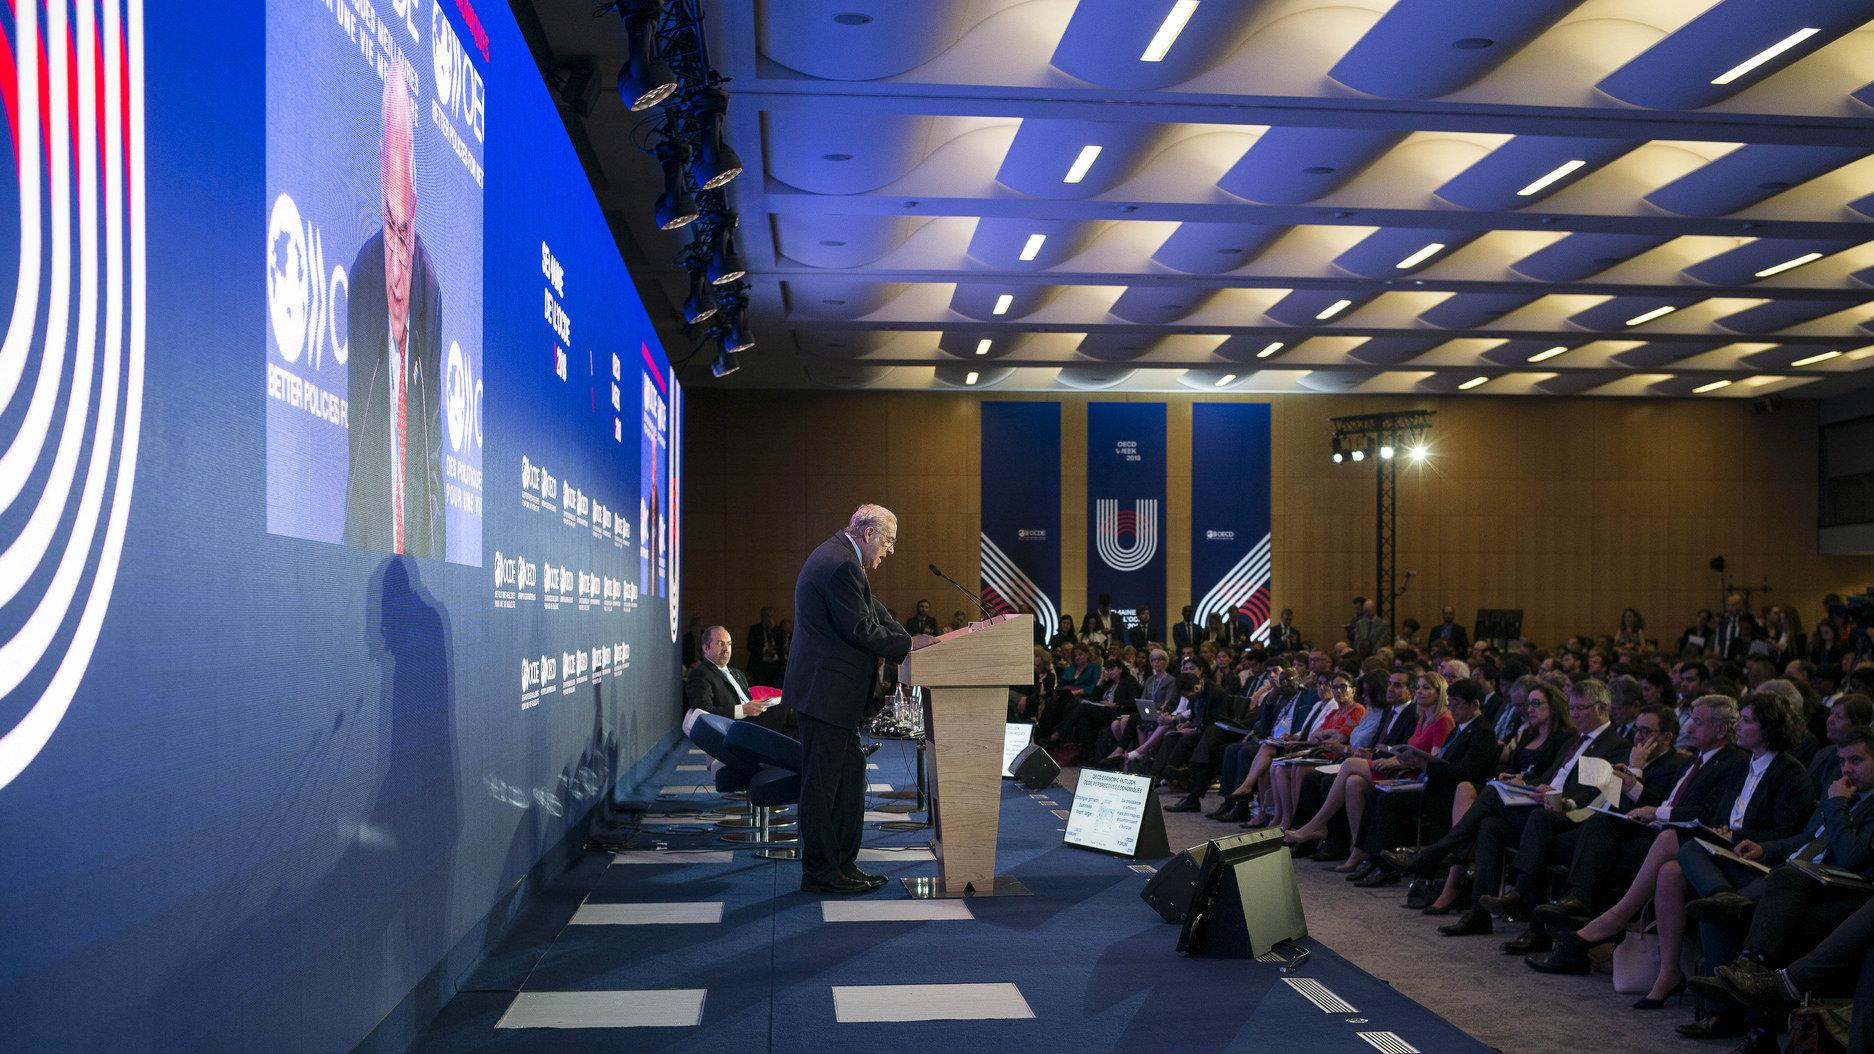 OECD secretary general Angel Gurria addresses conference crowd